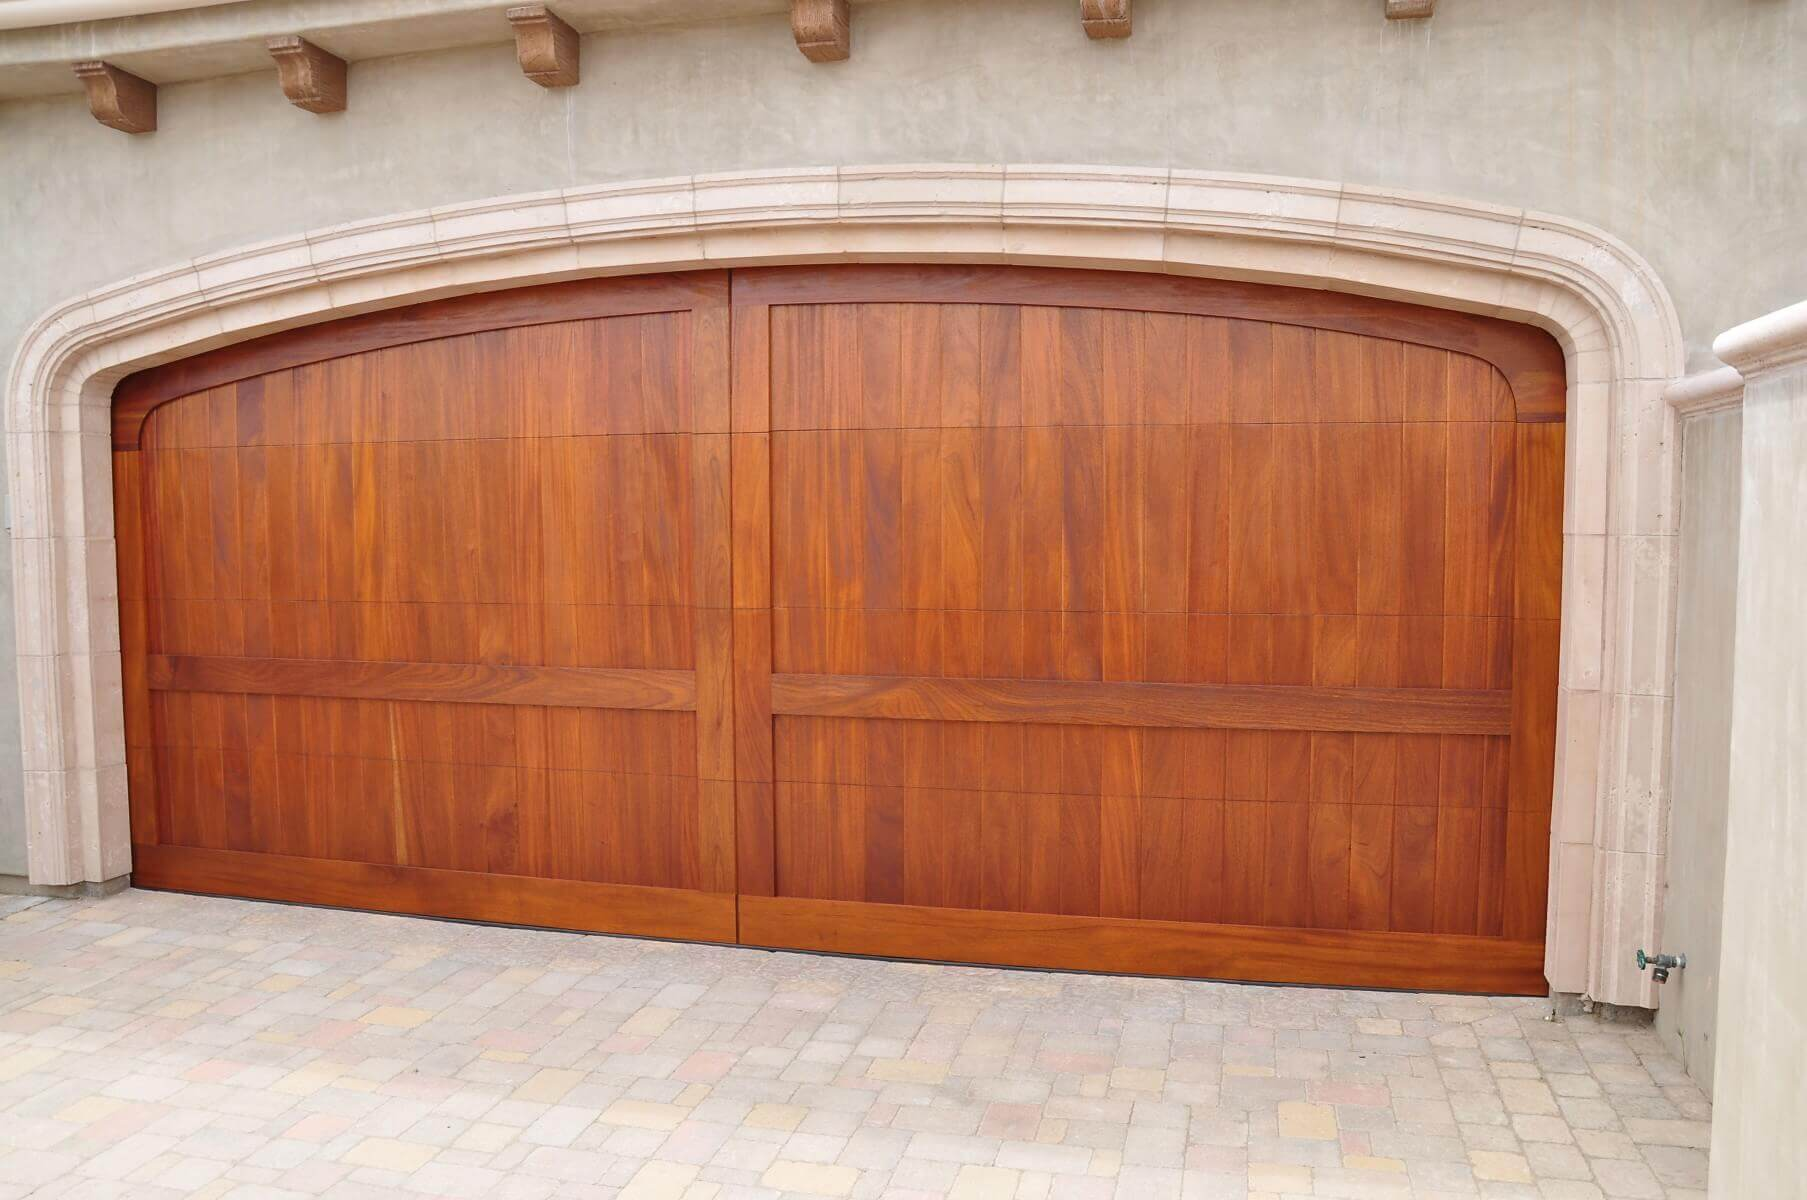 Merveilleux After Santa Rosa Valley Camarillo Garage Door Replacement (5)